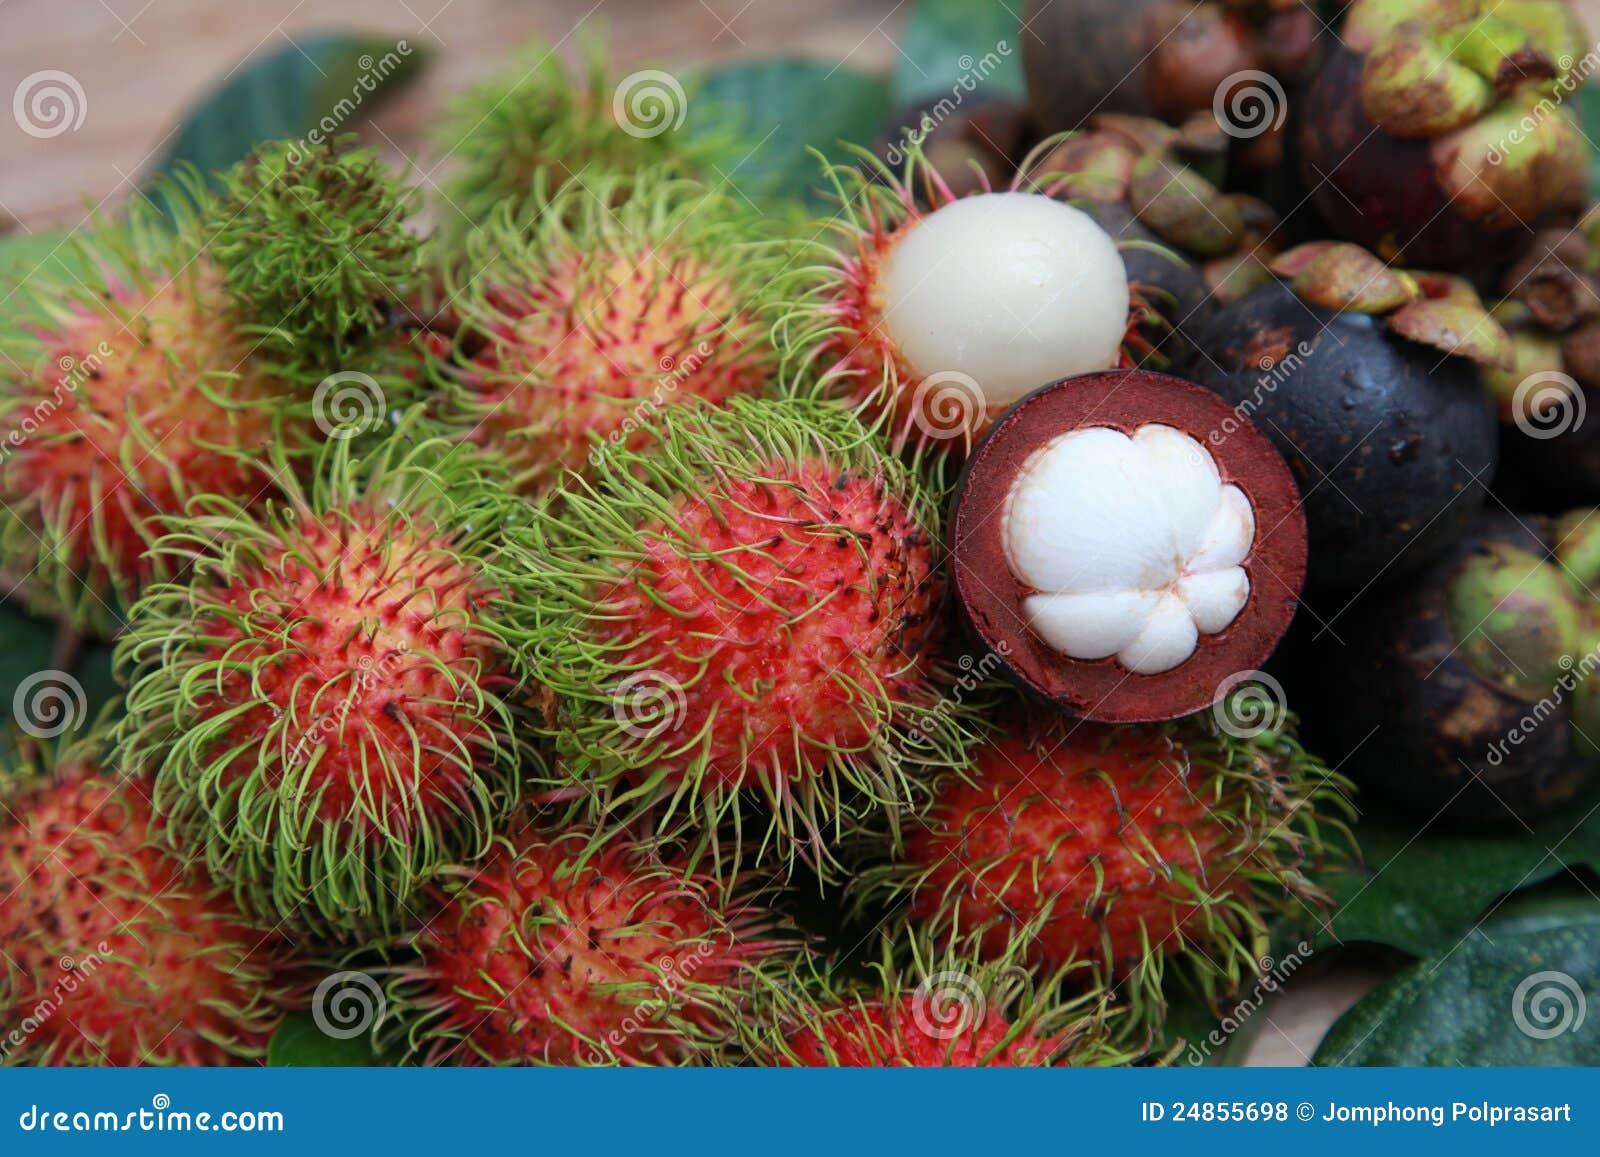 Mangosteen And Rambutan Royalty Free Stock Photos Image